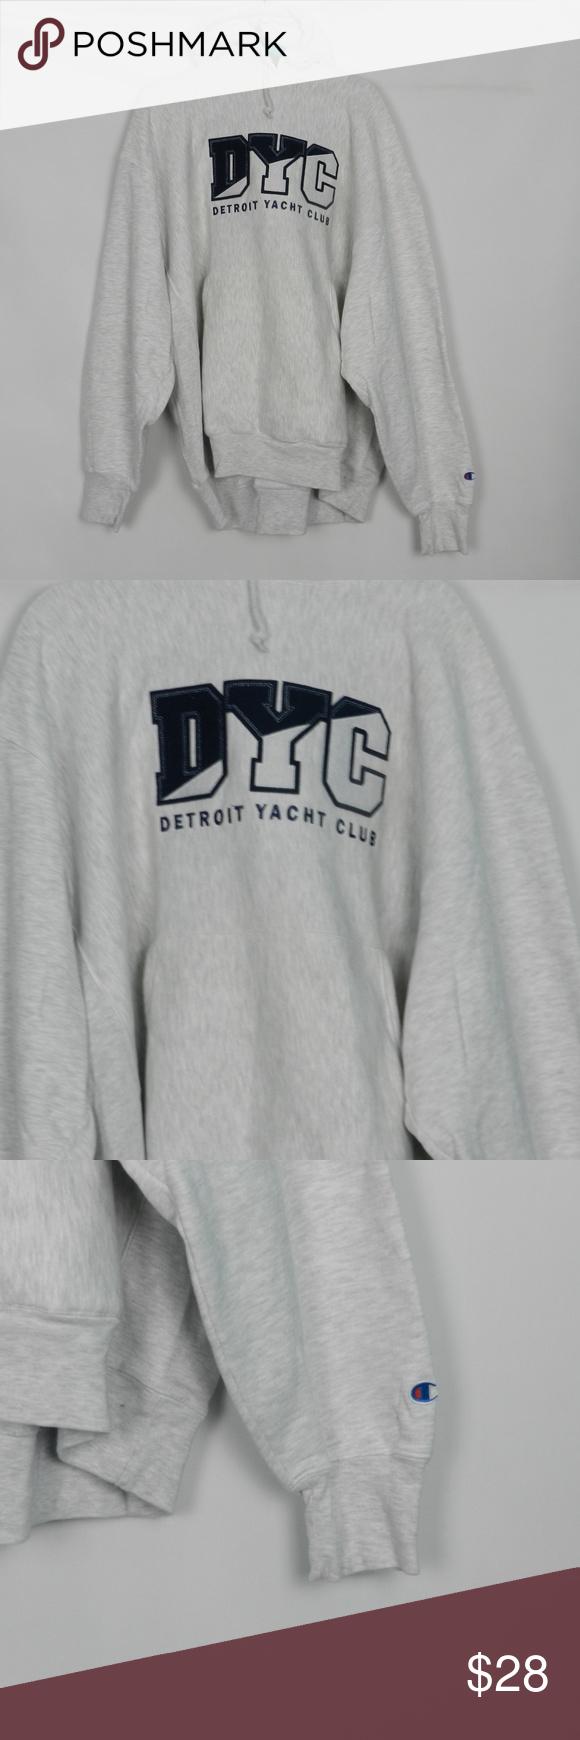 Detroit Yacht Club Hooded Sweatshirt Xxl Hooded Sweatshirts Sweatshirts Grey Hooded Sweatshirt [ 1740 x 580 Pixel ]